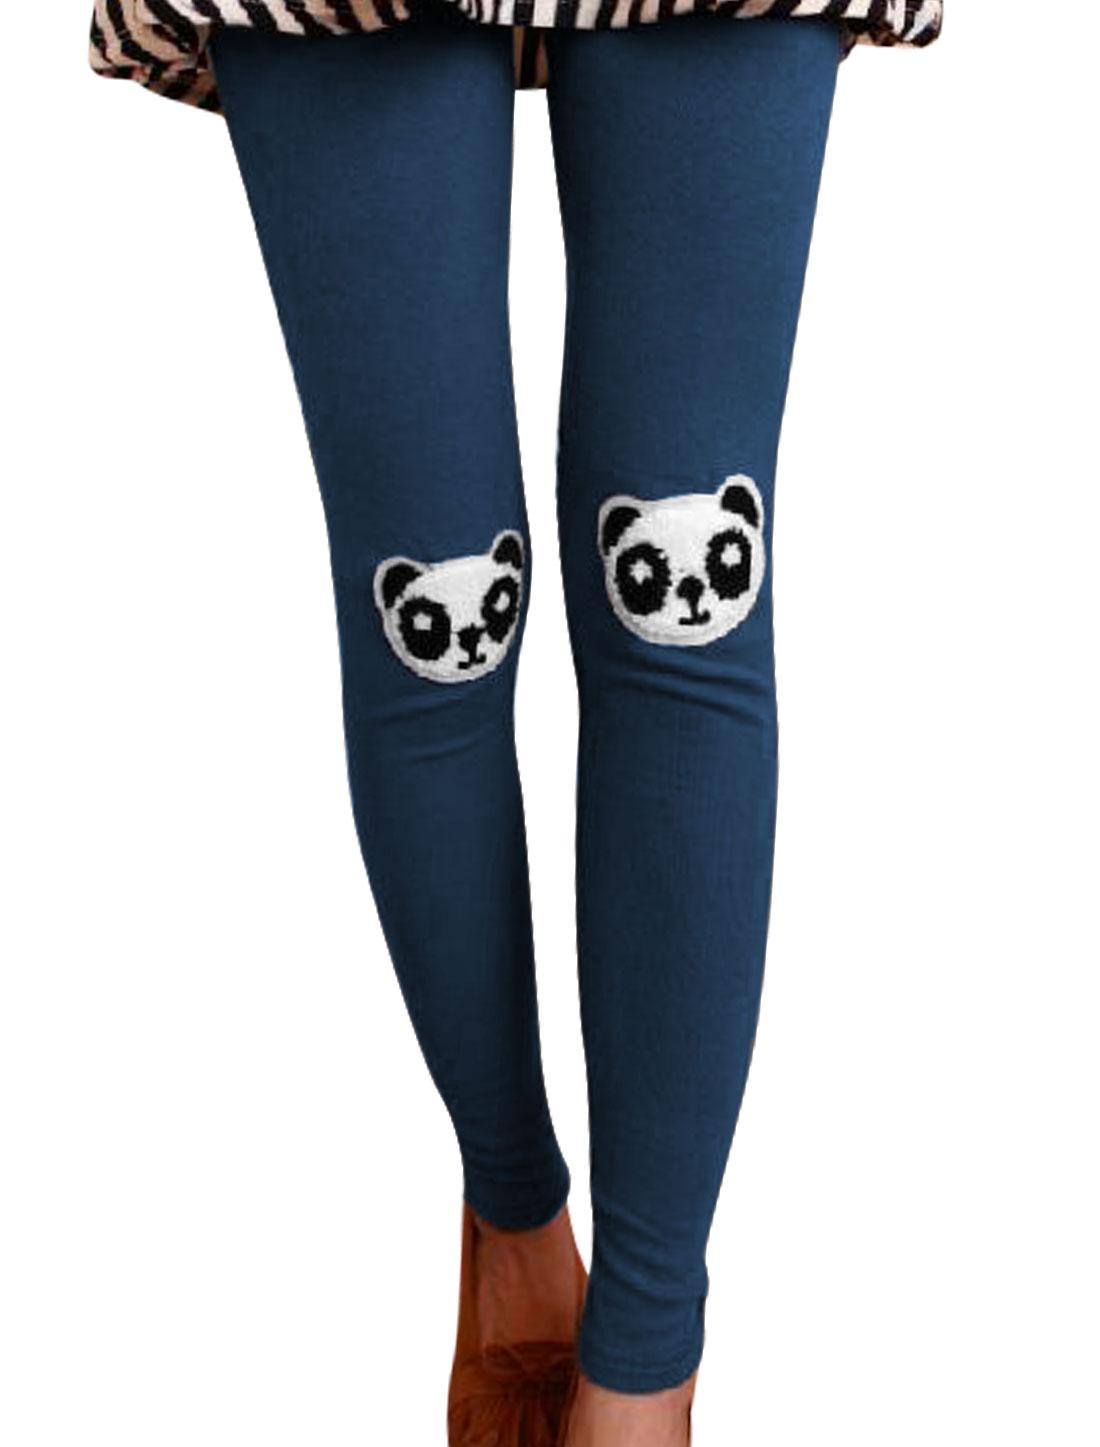 Ladies Stretchy Panda Applique Stylish Navy Blue Leggings XS